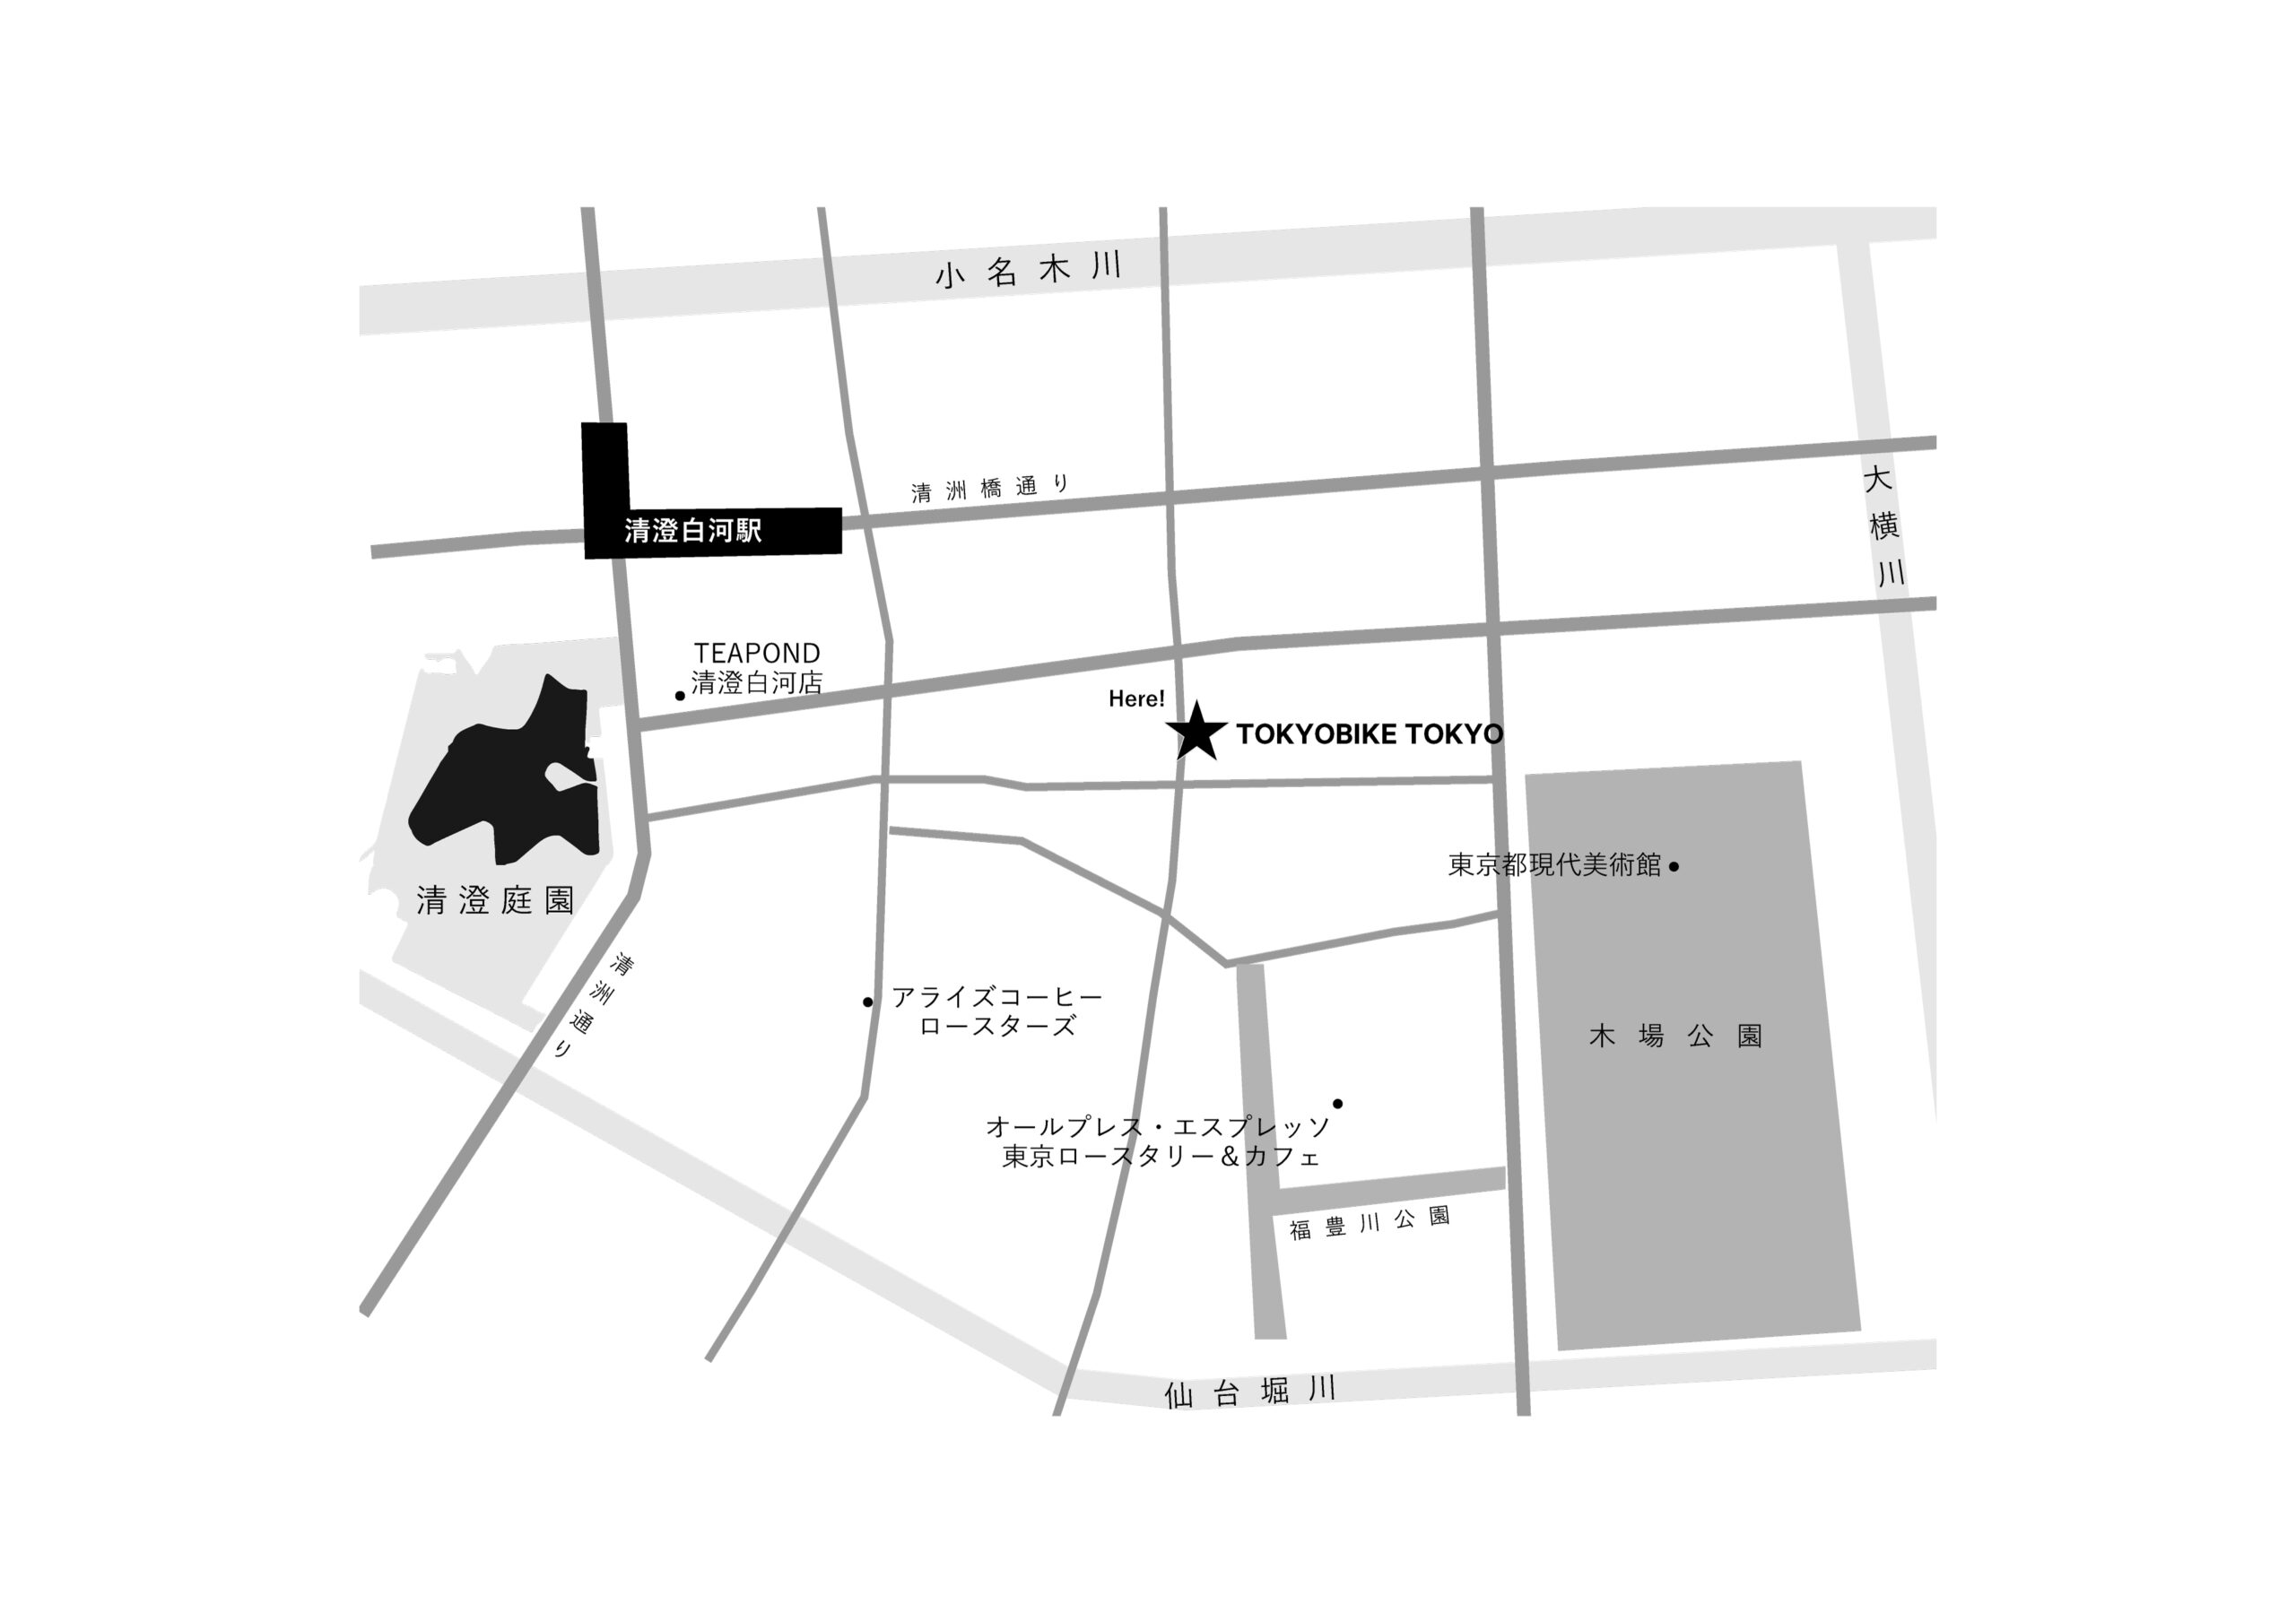 〈TOKYOBIKE TOKYO〉周辺 清澄白河エリアマップ